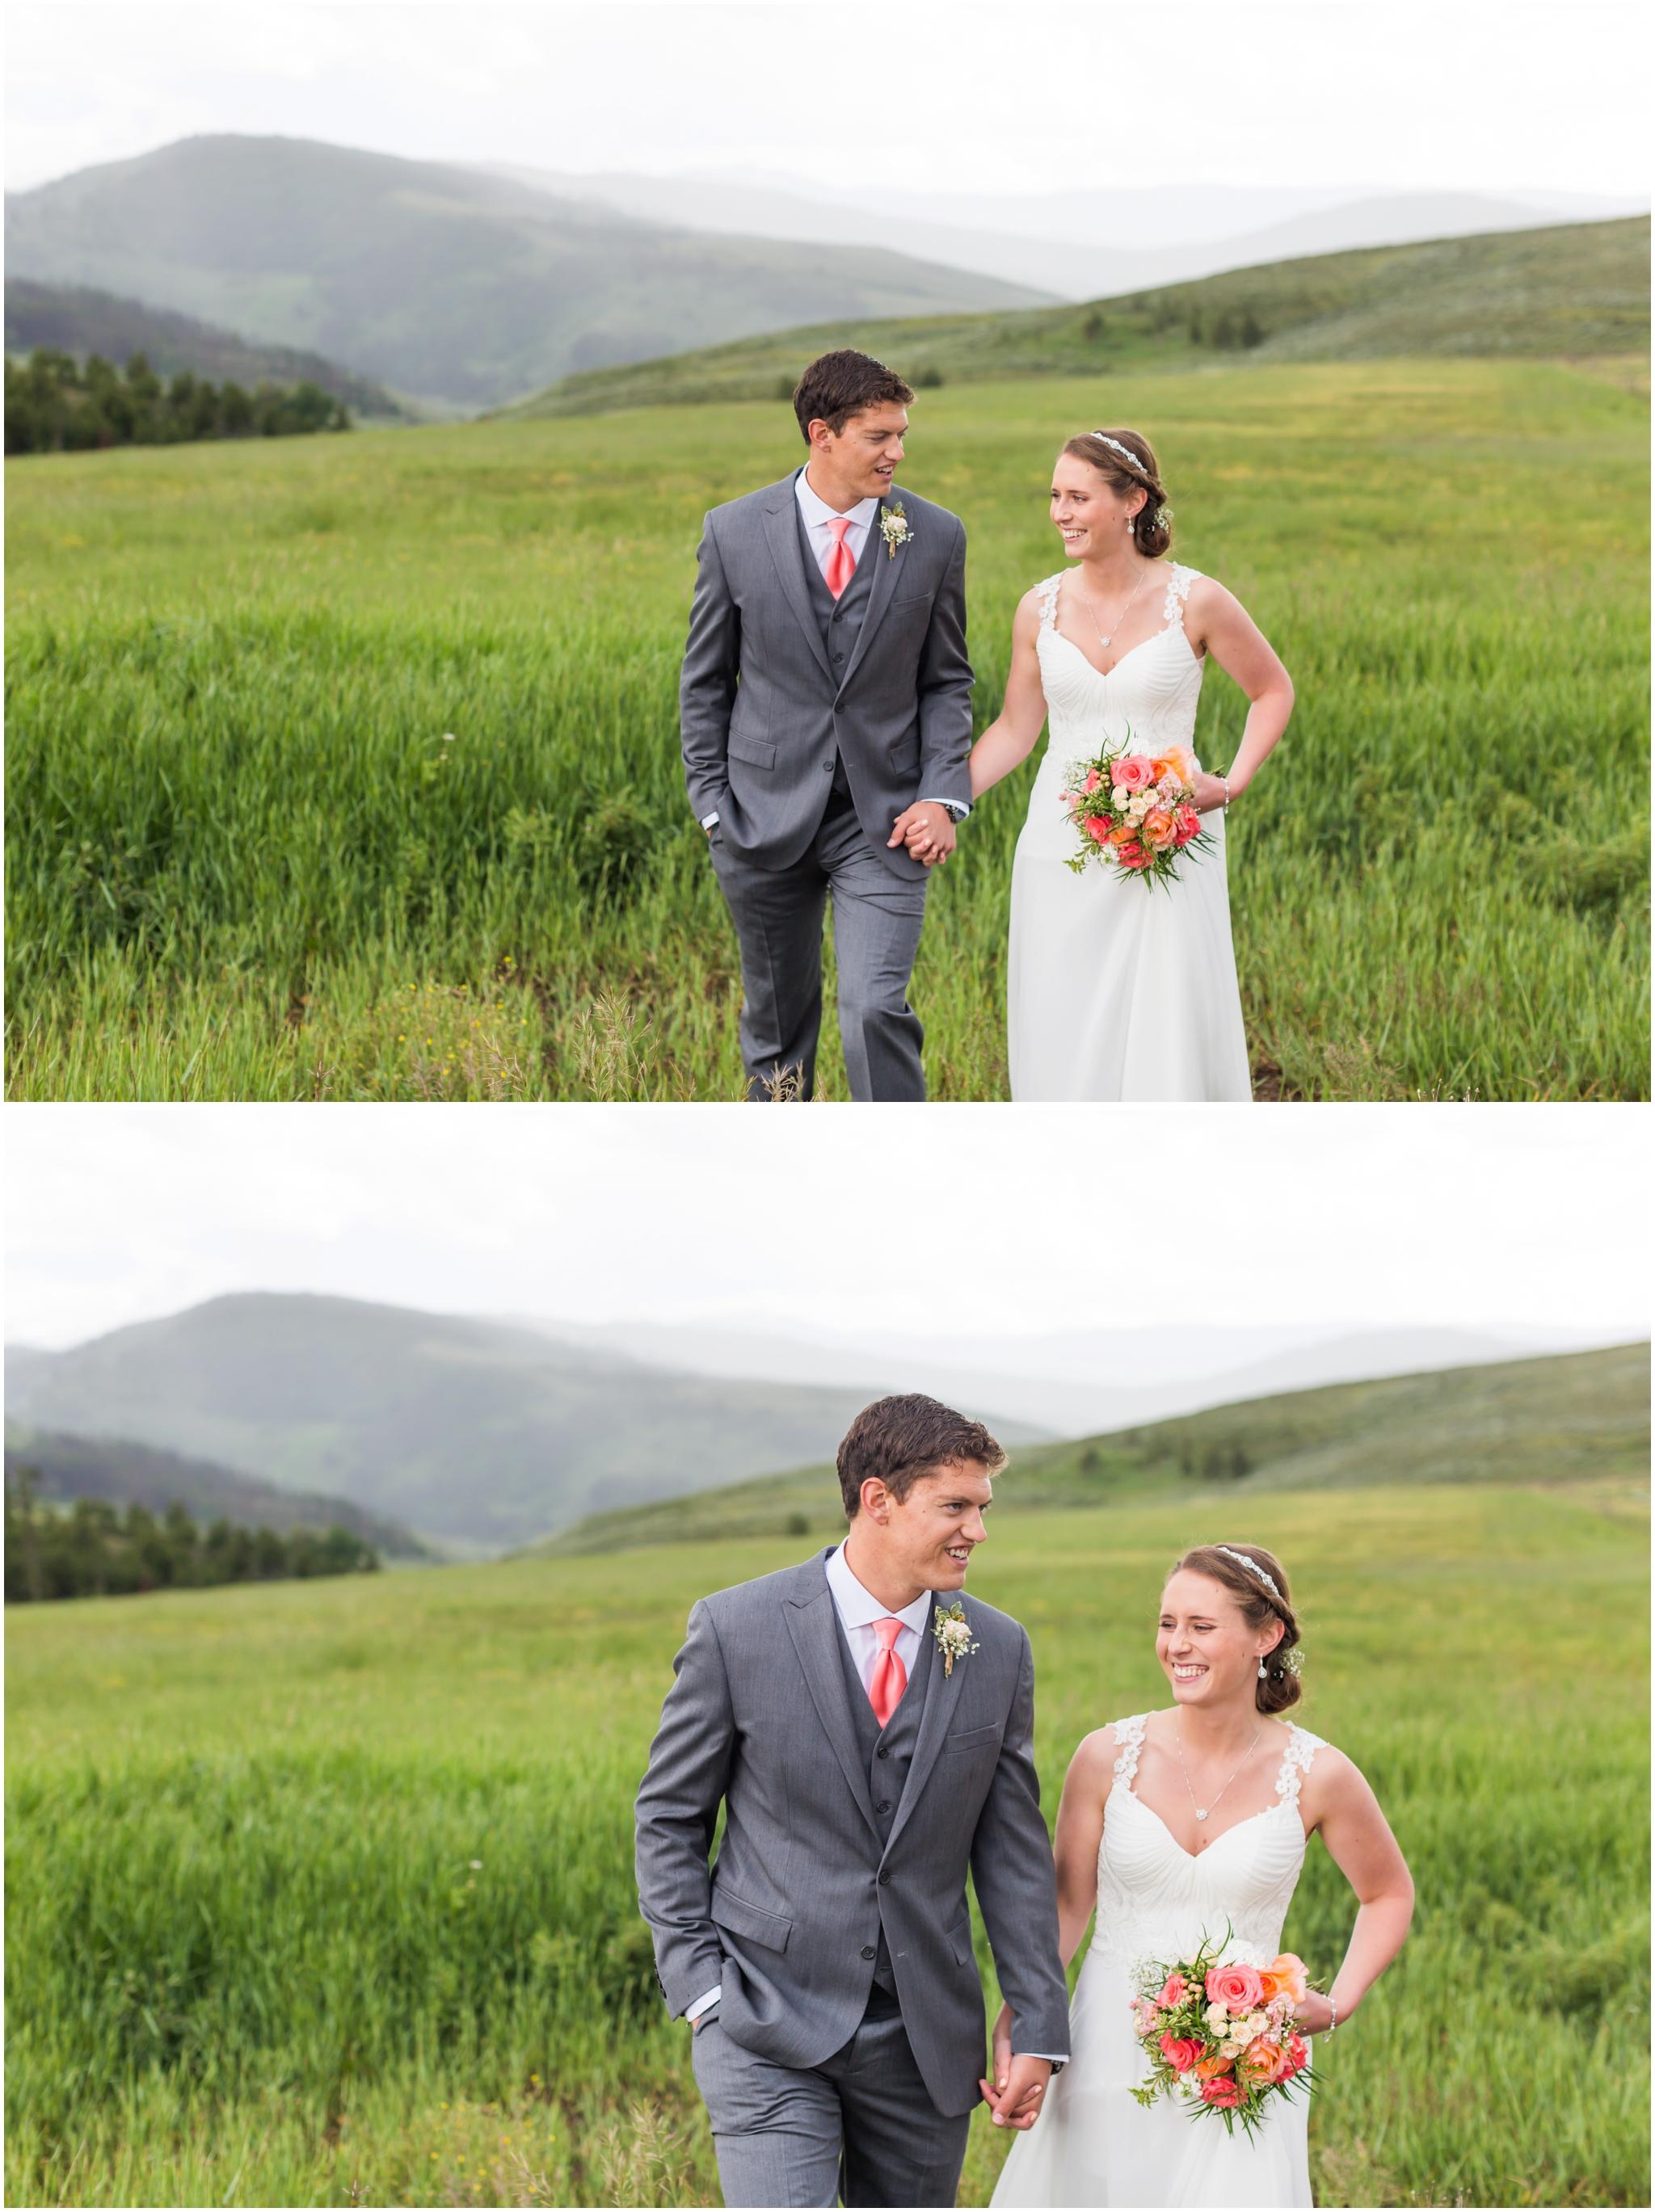 Strawberry_Creek_Ranch_Wedding_Photographer23.jpg